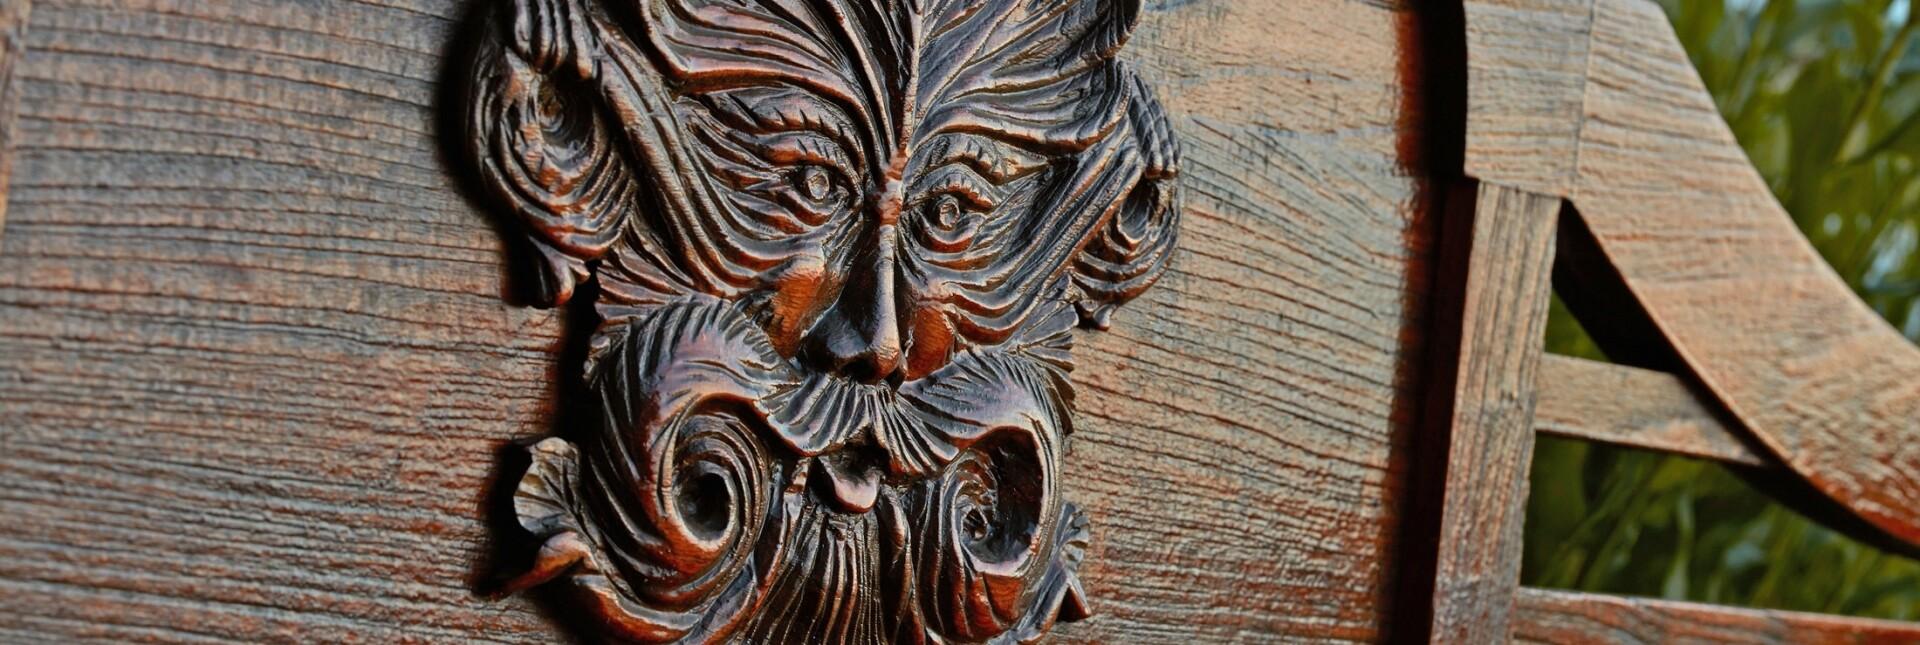 whistling-straits-logo-wood.jpg